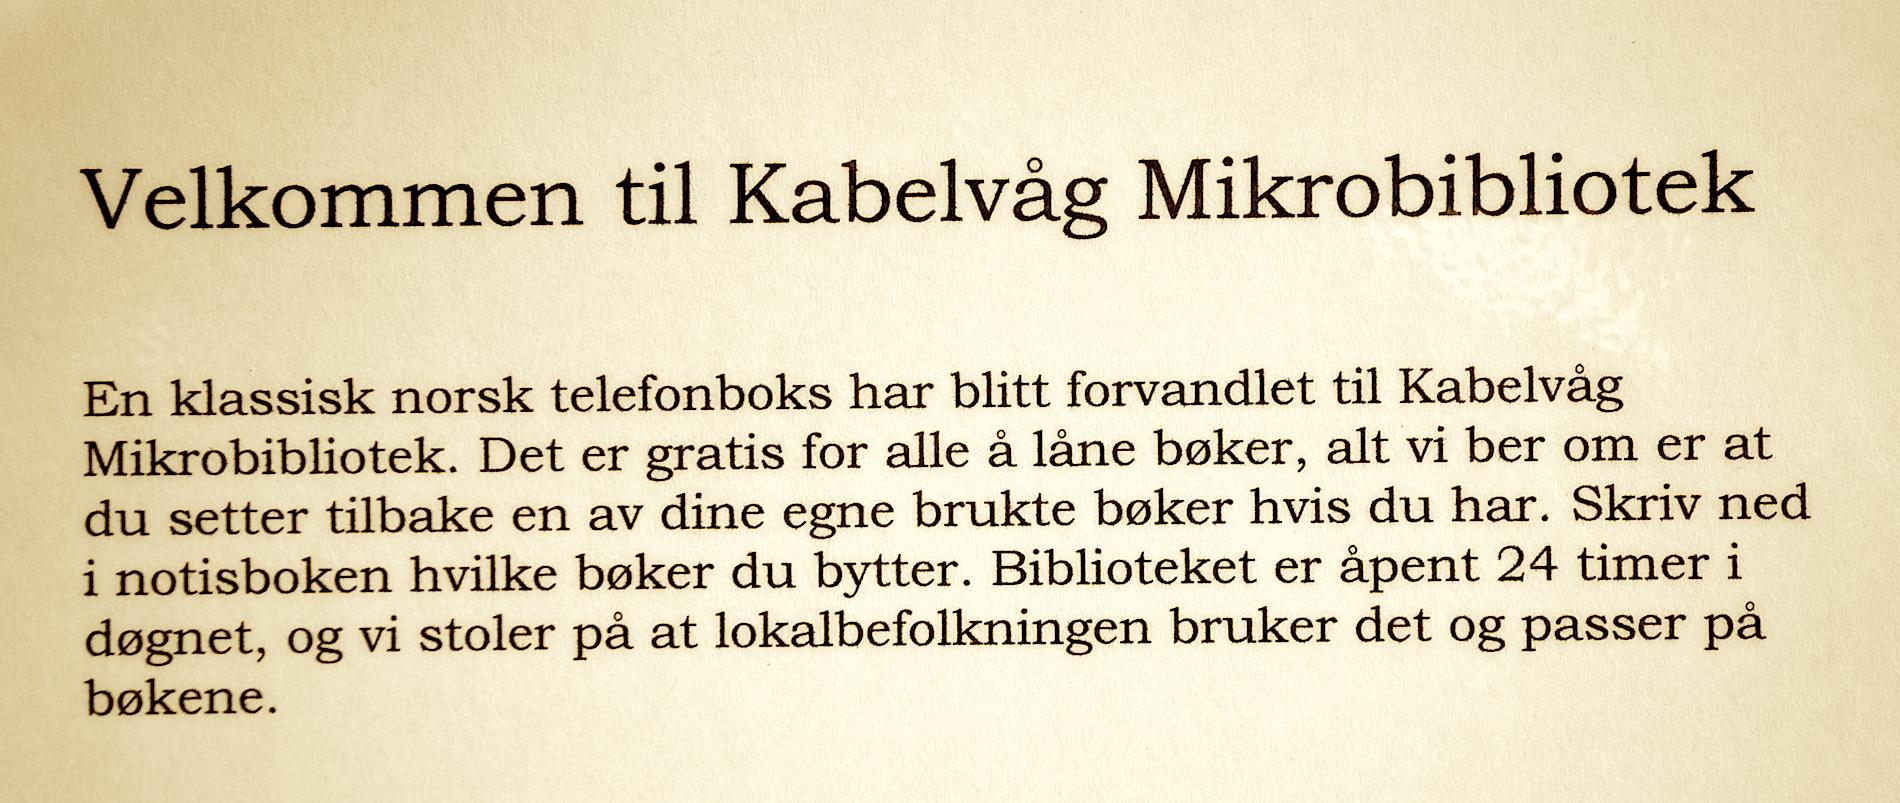 Kabelvaag-Mikobibliotek-3